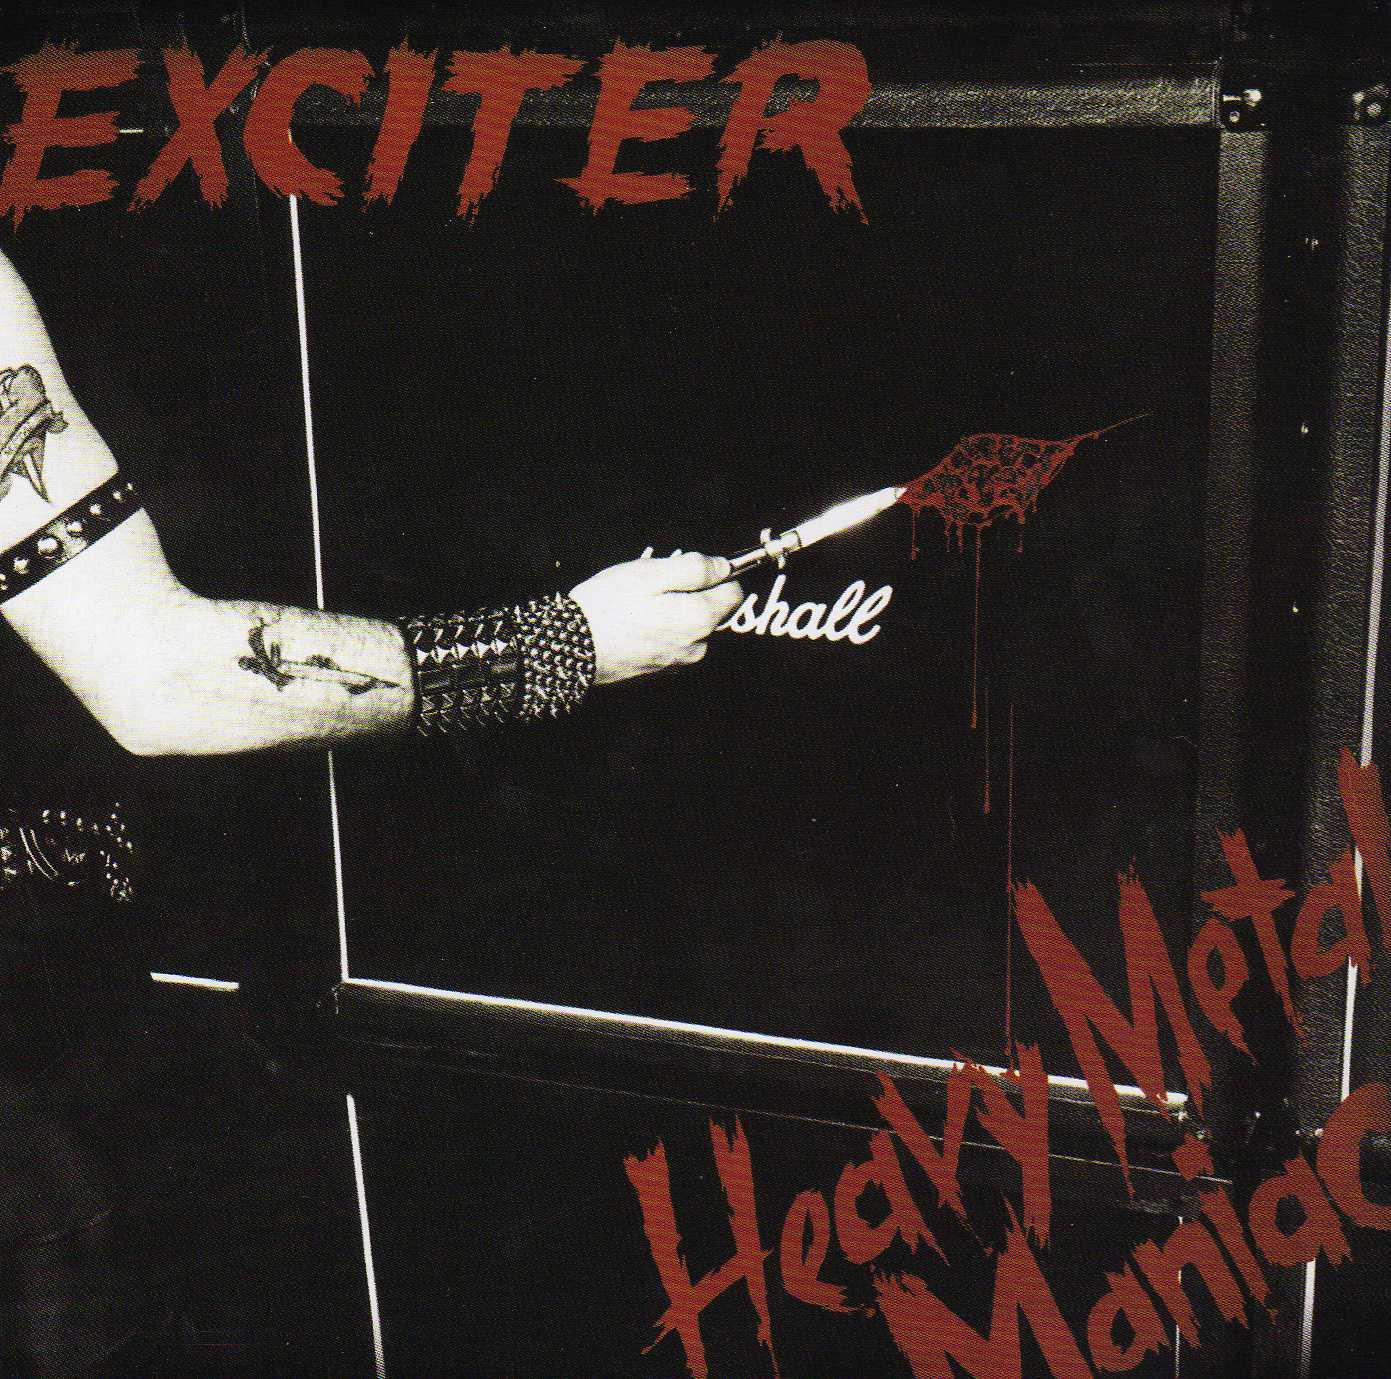 http://2.bp.blogspot.com/-r7czBp0-WsI/Tam4zmYBL-I/AAAAAAAAAEU/cKxVnmRAVf0/s1600/Exciter+-+Heavy+Metal+Maniac+%2528SE%2529+-+Front.jpg